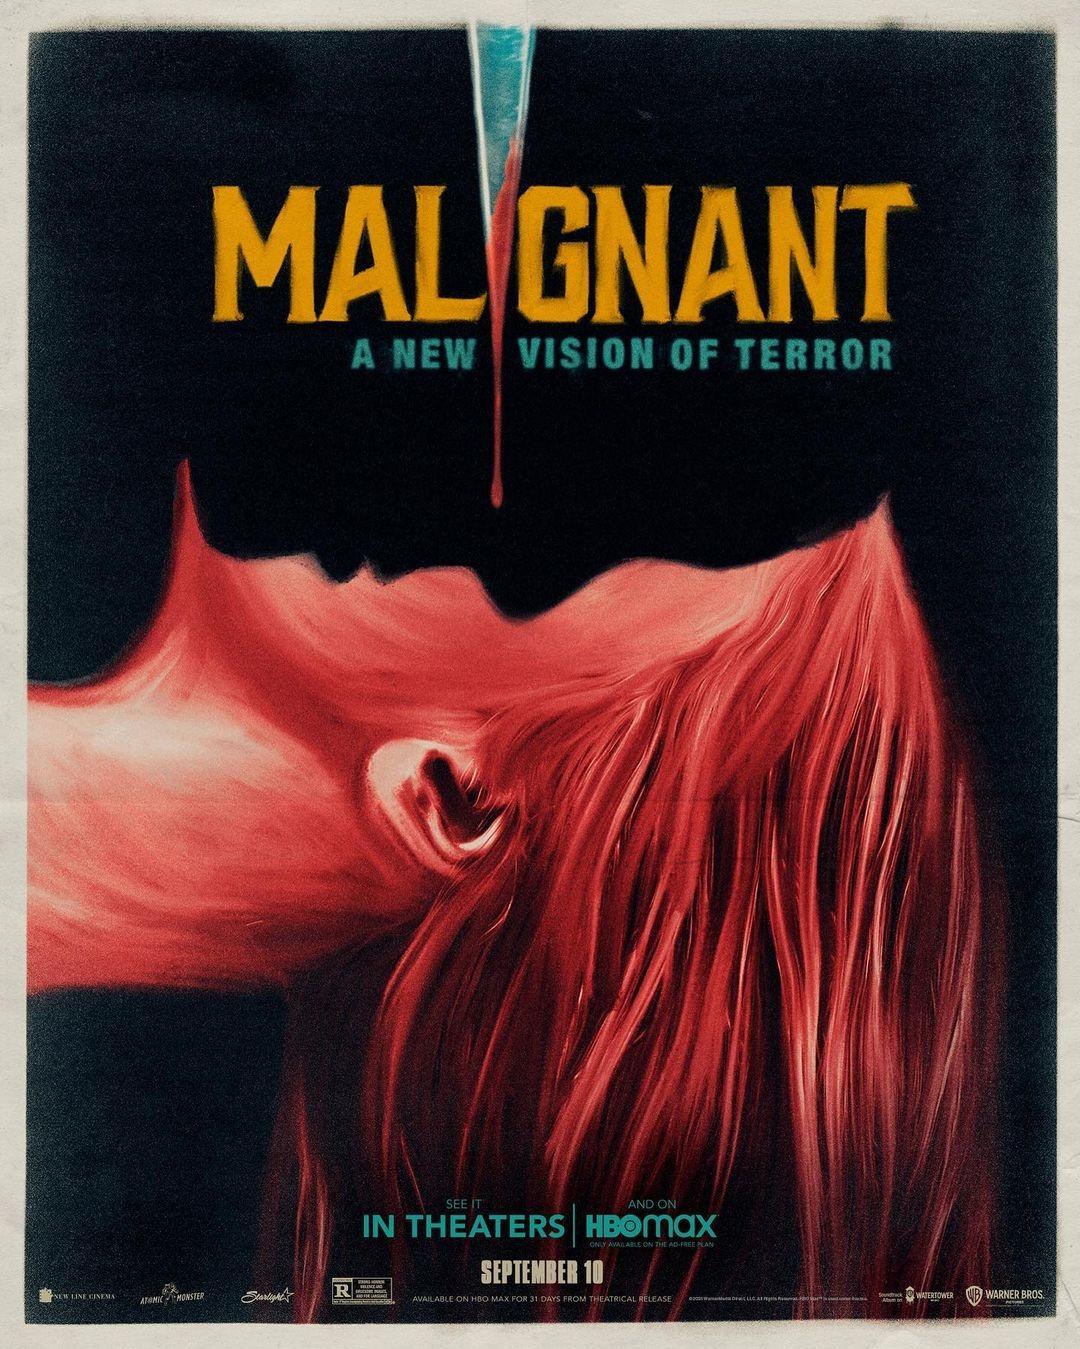 Download Malignant (2021) Telugu Dubbed (Voice Over) & English [Dual Audio] WebRip 720p [1XBET] FREE on 1XCinema.com & KatMovieHD.sk